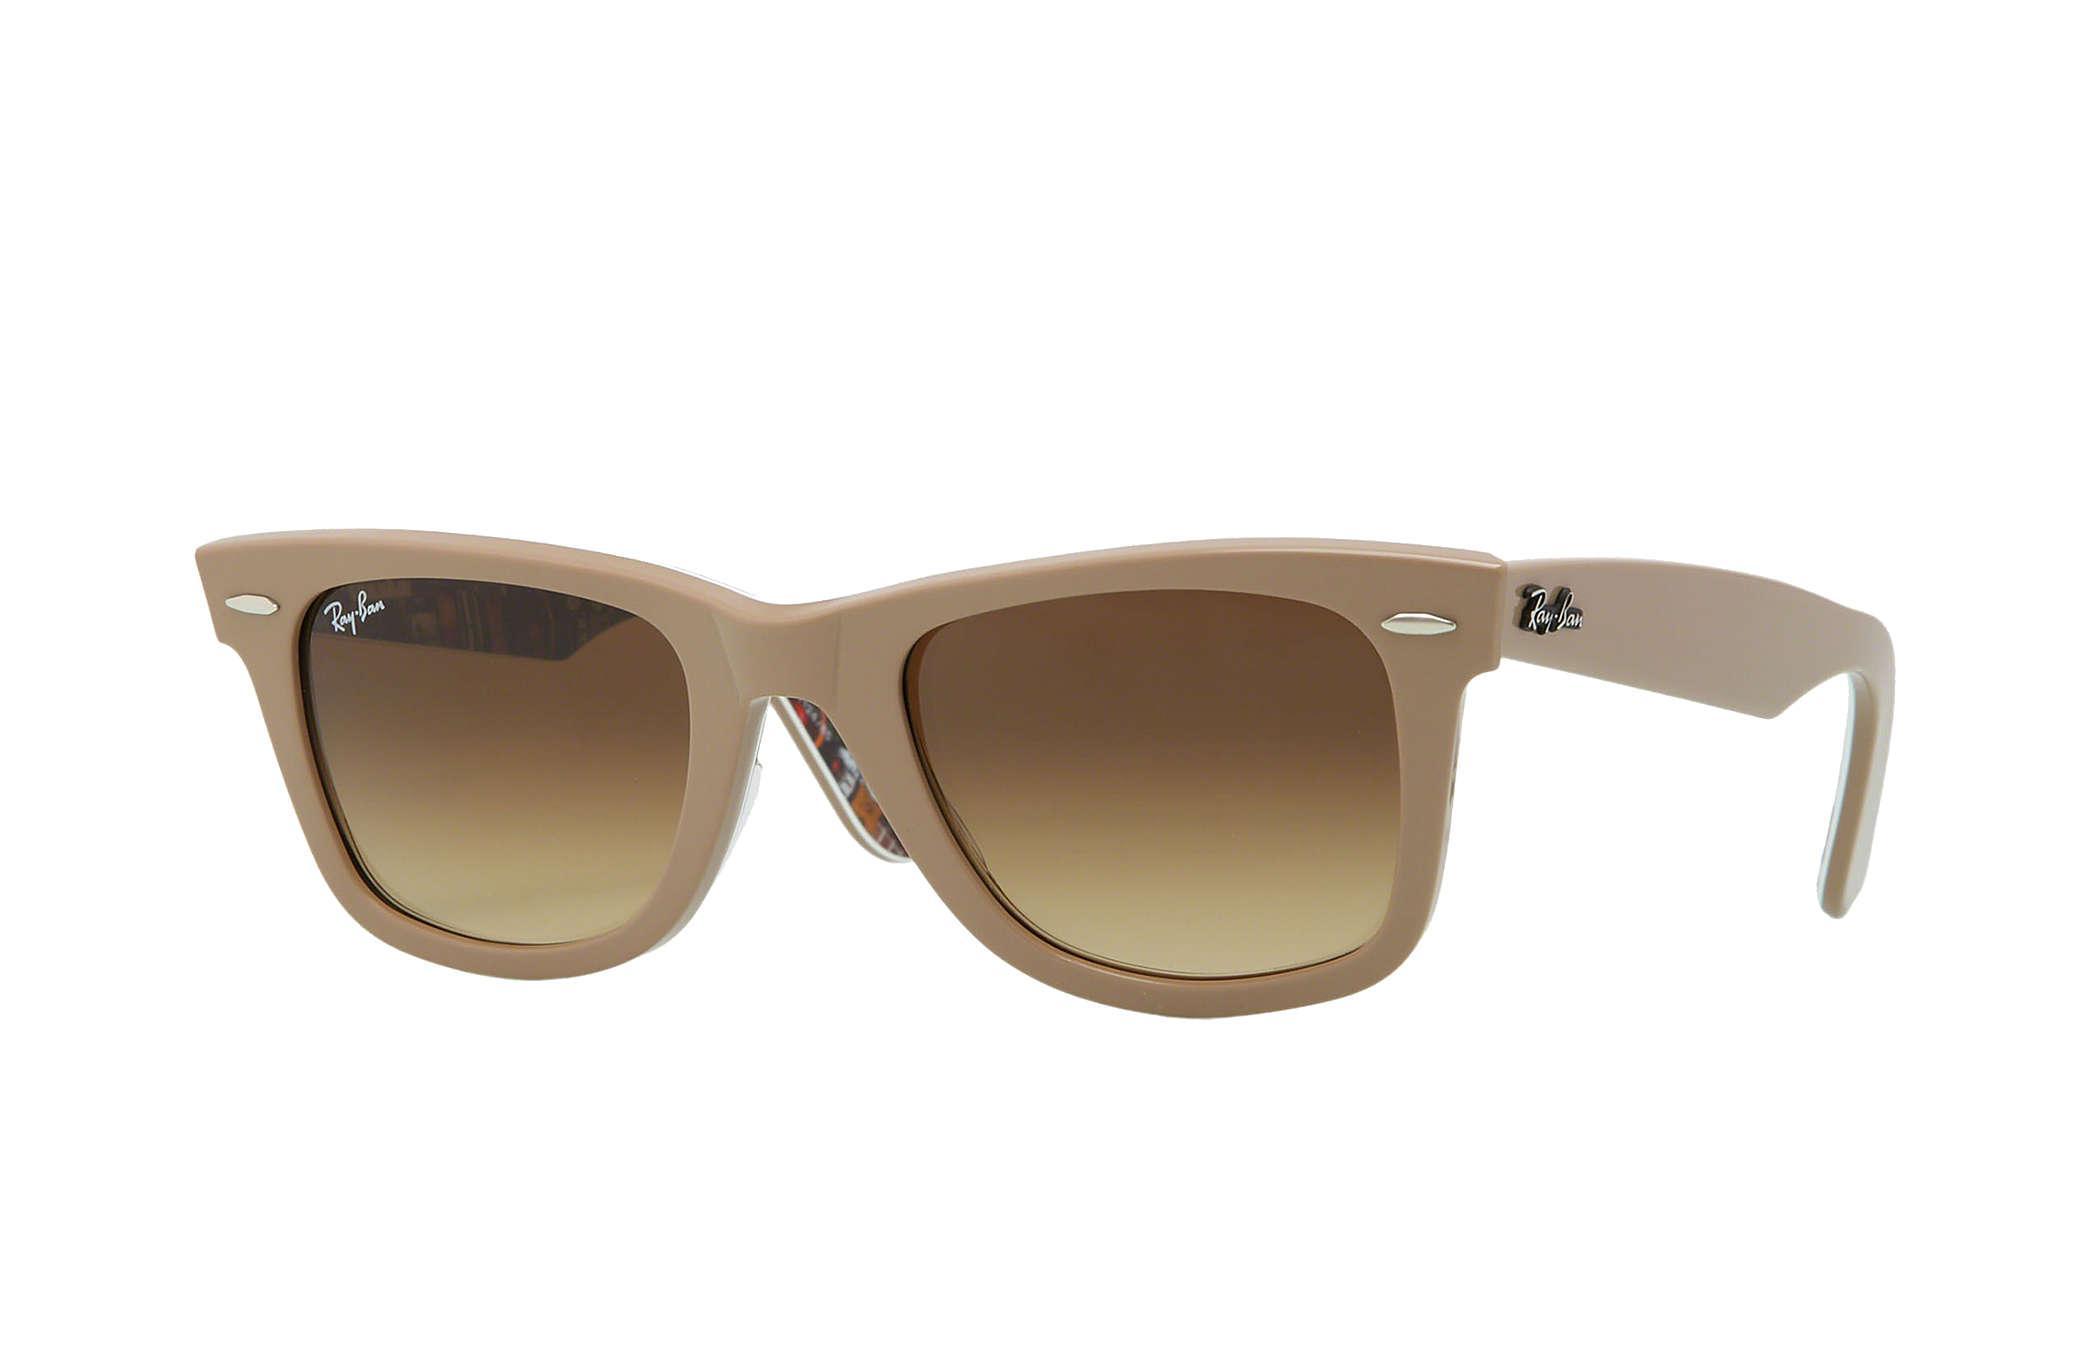 dadb24325e ... rb2140 brown leopard sunglasses aa81d 022c2  australia lyst ray ban  original wayfarer rare prints in brown a755c dcff5